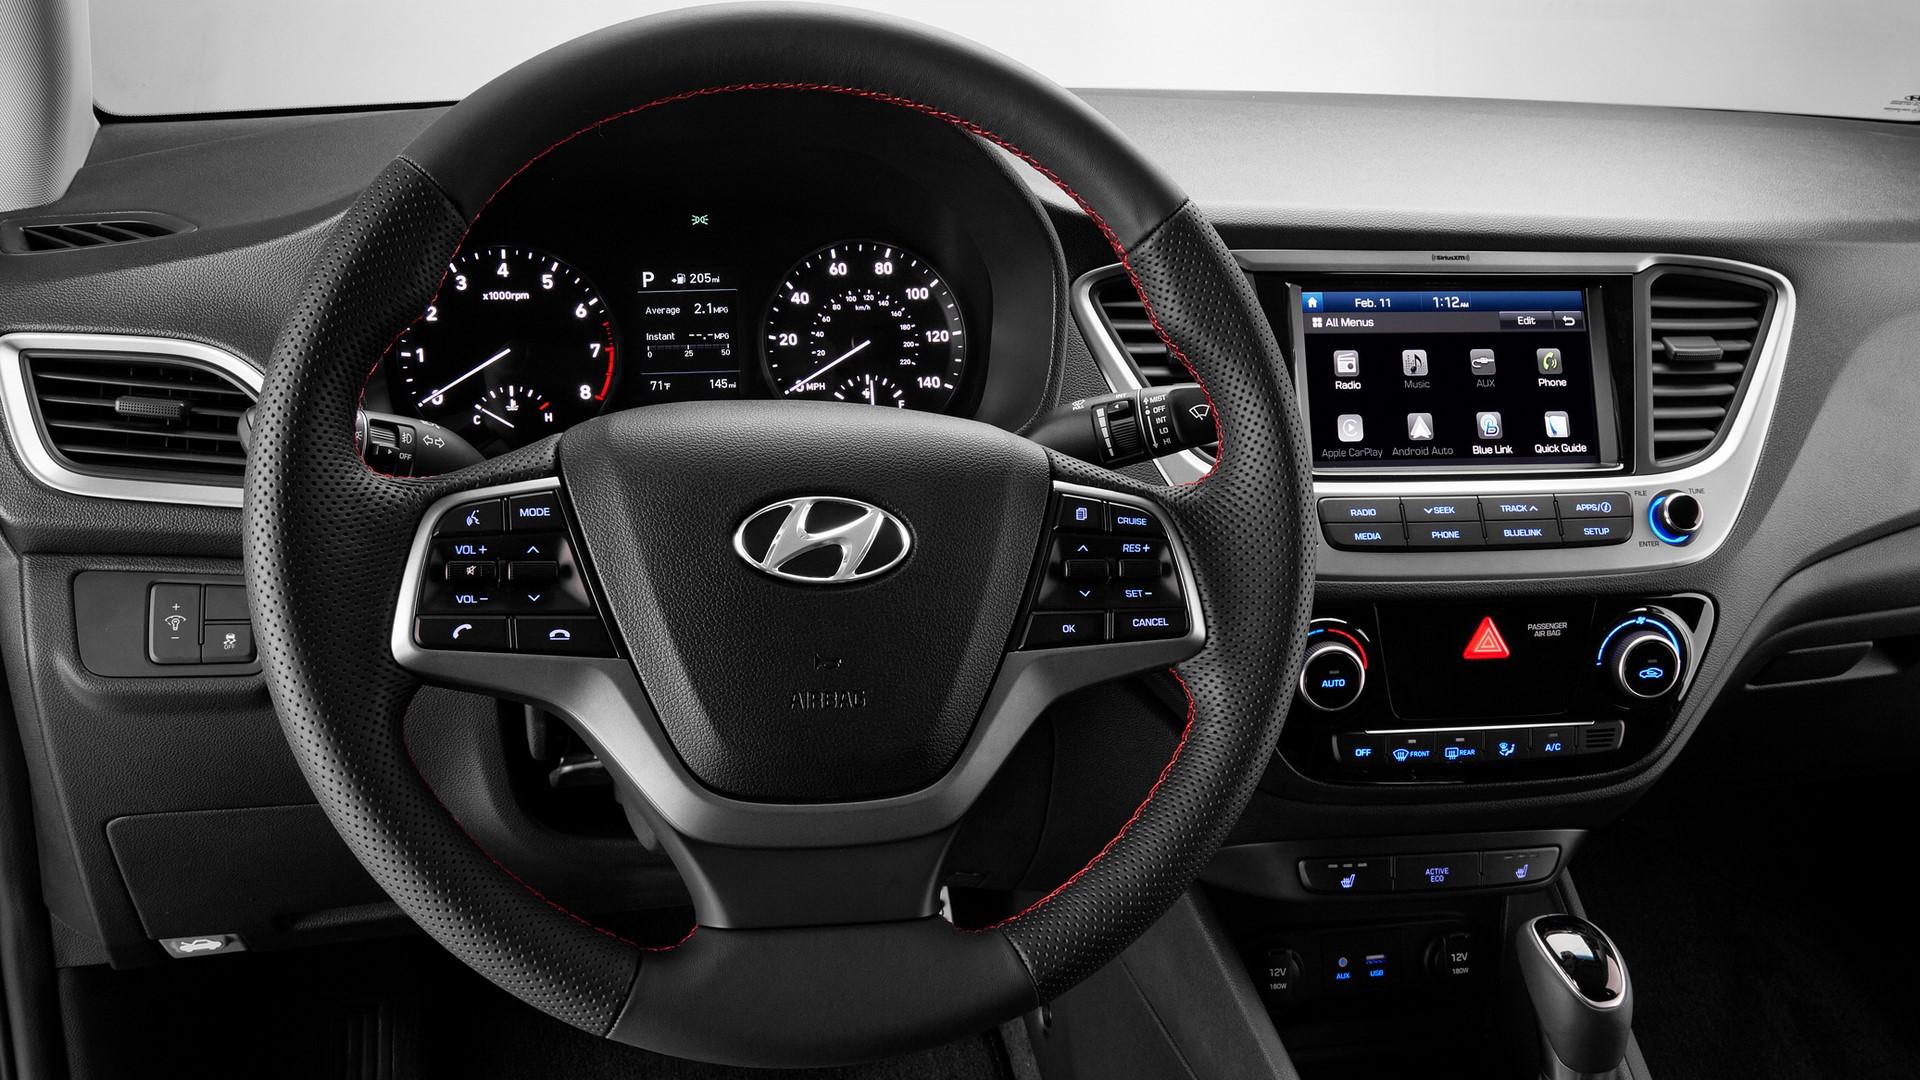 Hyundai Accent 2018 (10)